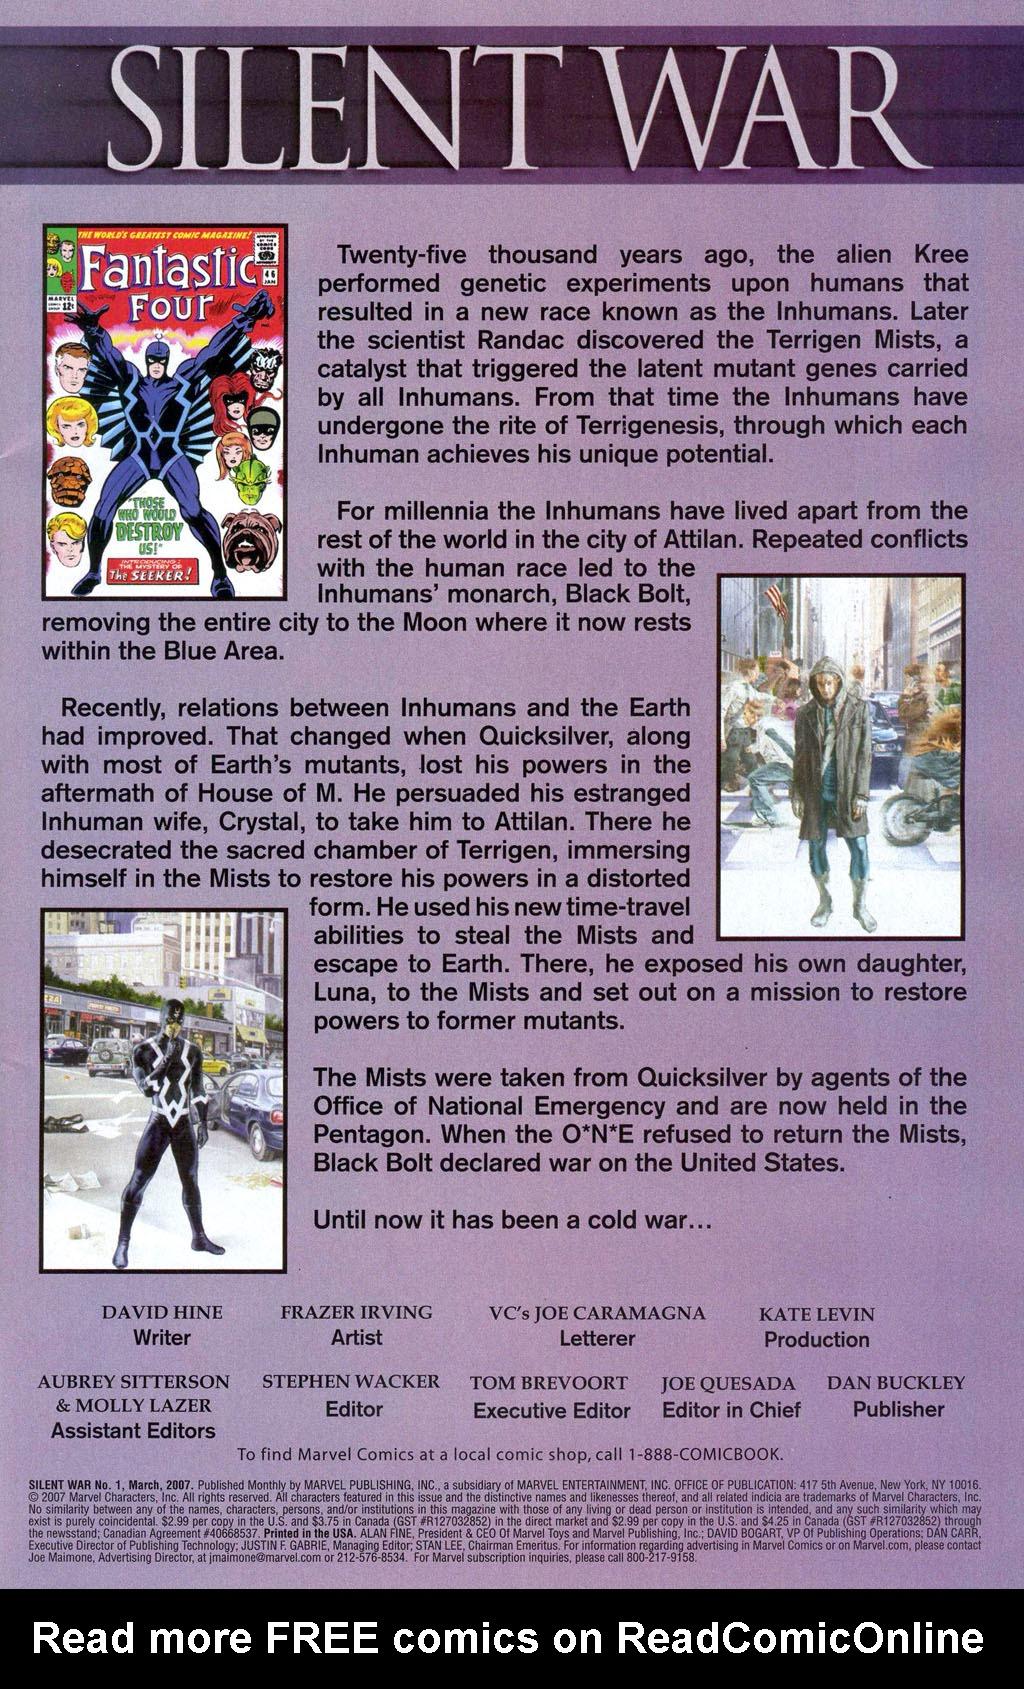 Read online Silent War comic -  Issue #1 - 2